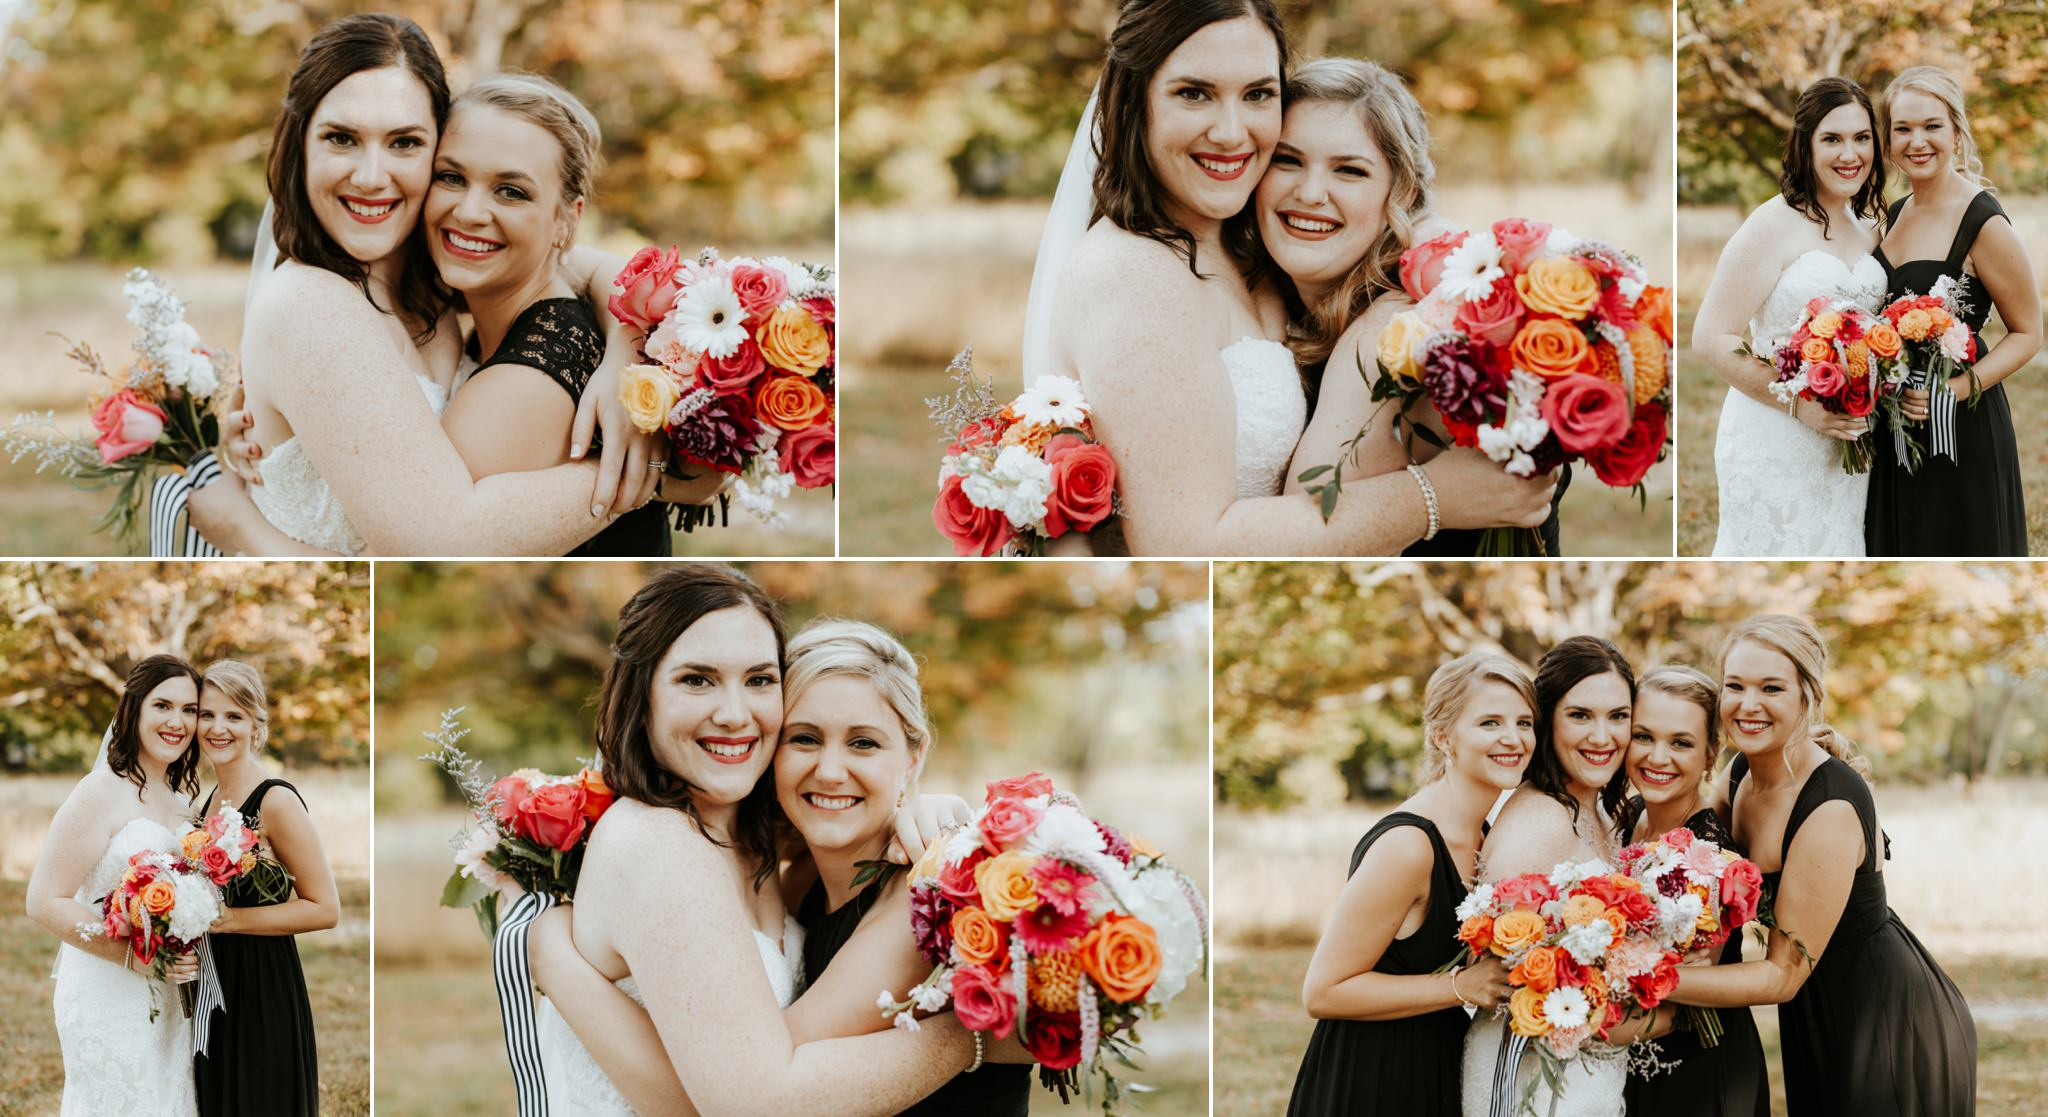 17-09-15 Lindsey and Brandon Wedding Edited-418_WEB.jpg